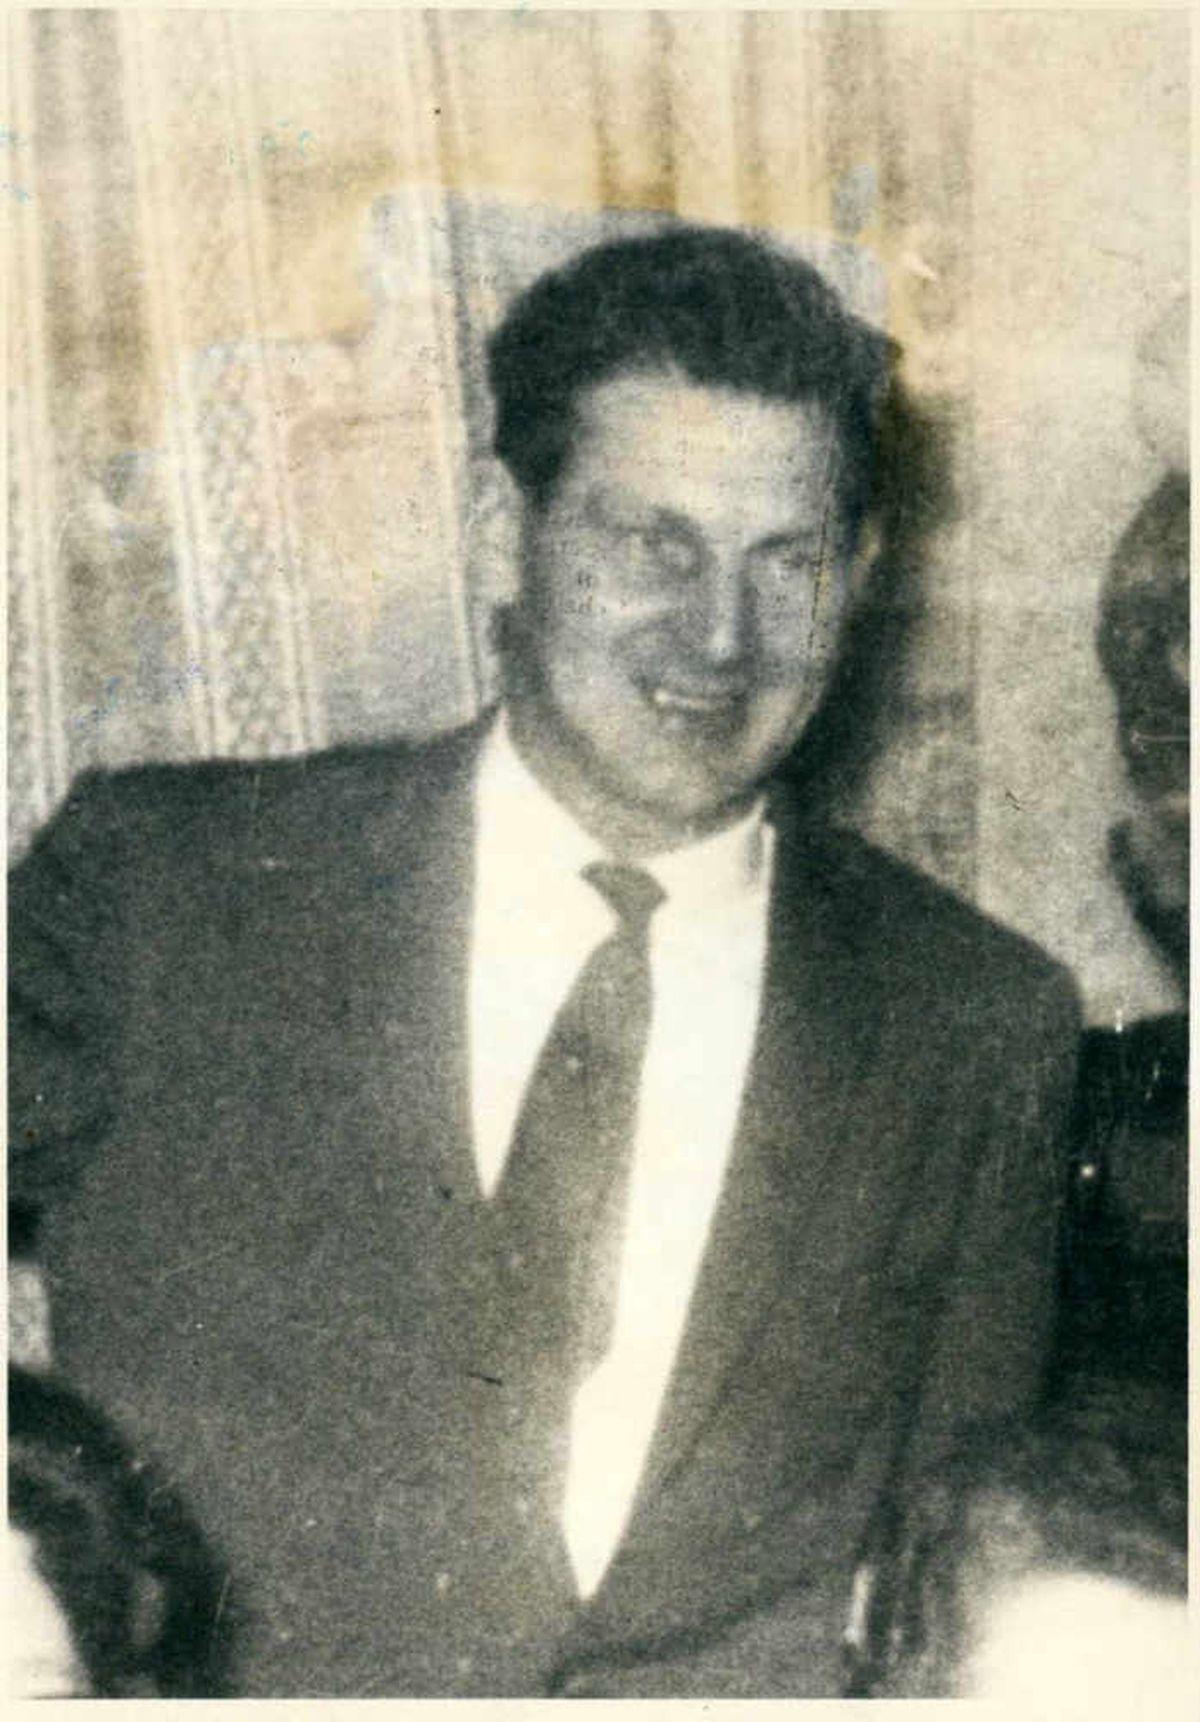 Jill's father George Burkitt was 48 when he was killed